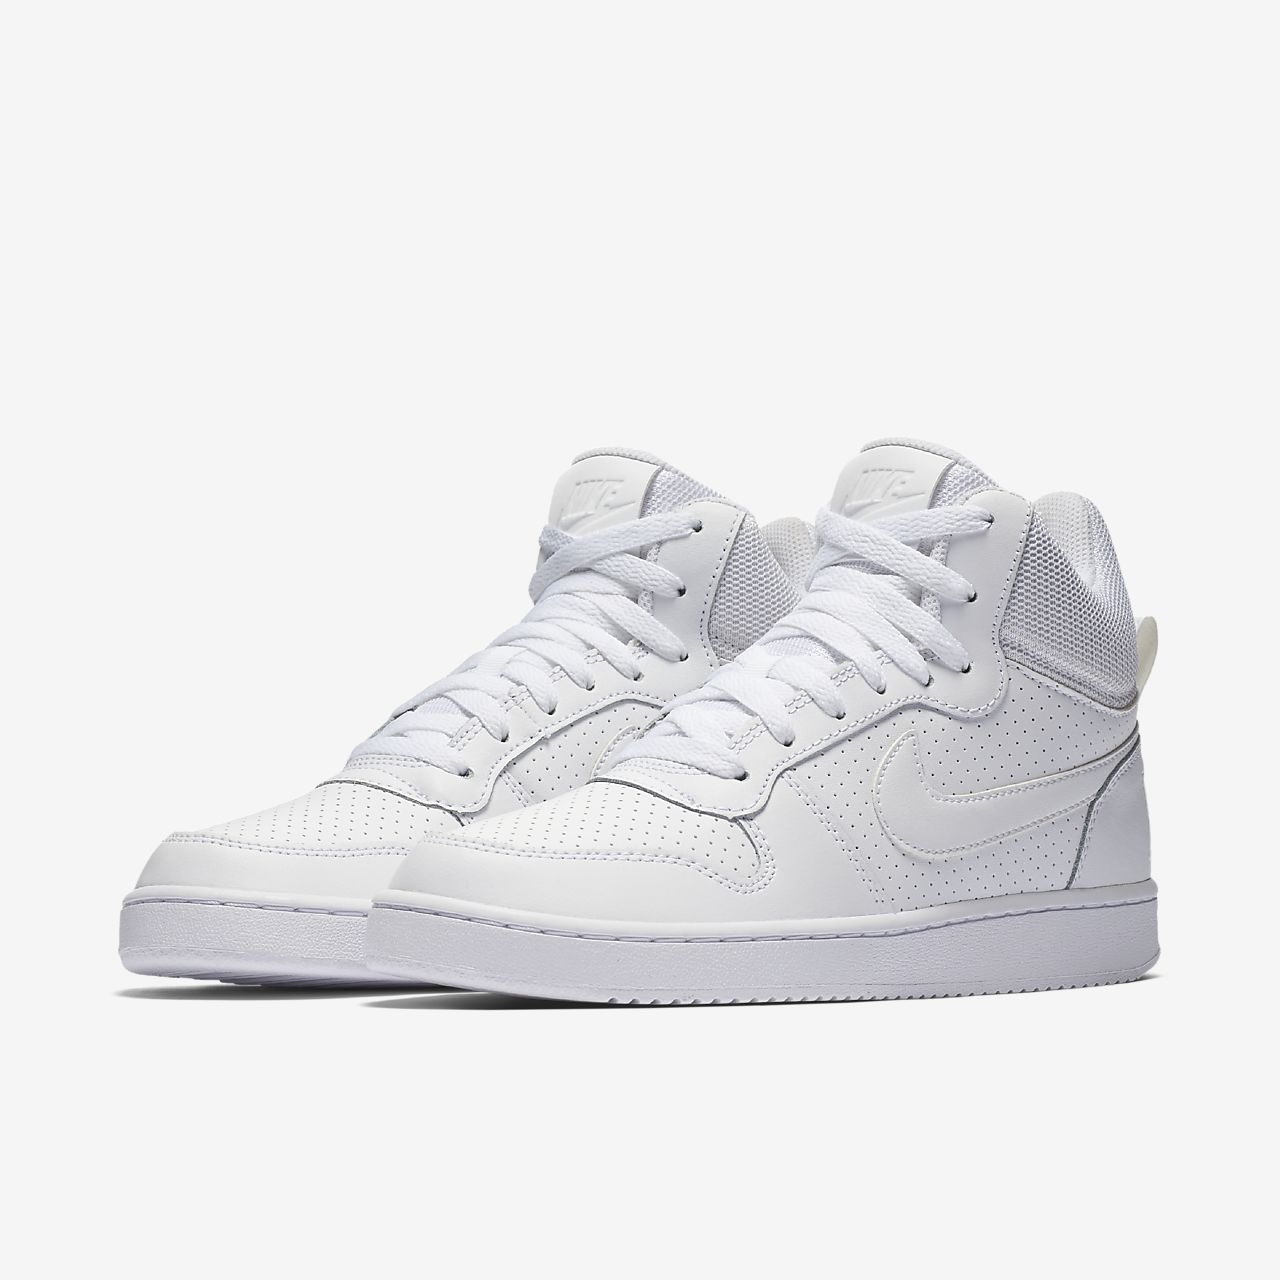 brand new f7f85 f4bcb Zapatos blancos Nike Court Borough Mid para mujer OrMu3pzG